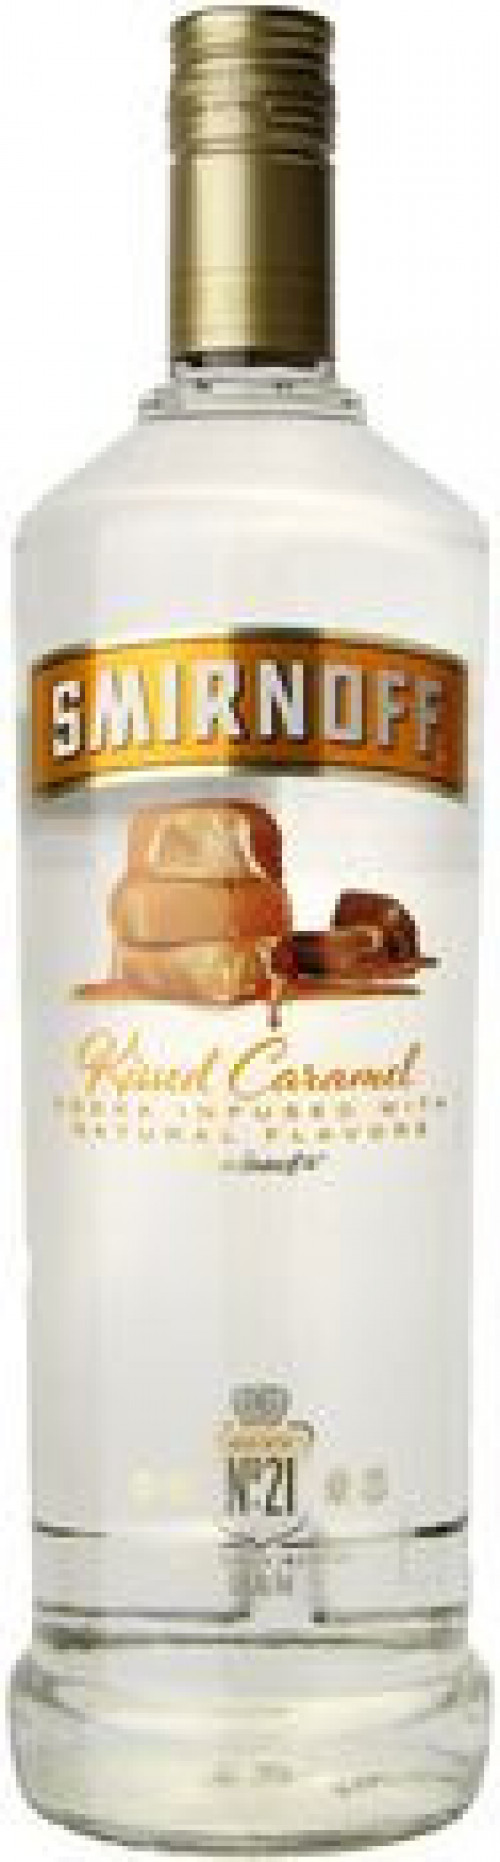 Smirnoff Kissed Caramel Flavored Vodka 1L